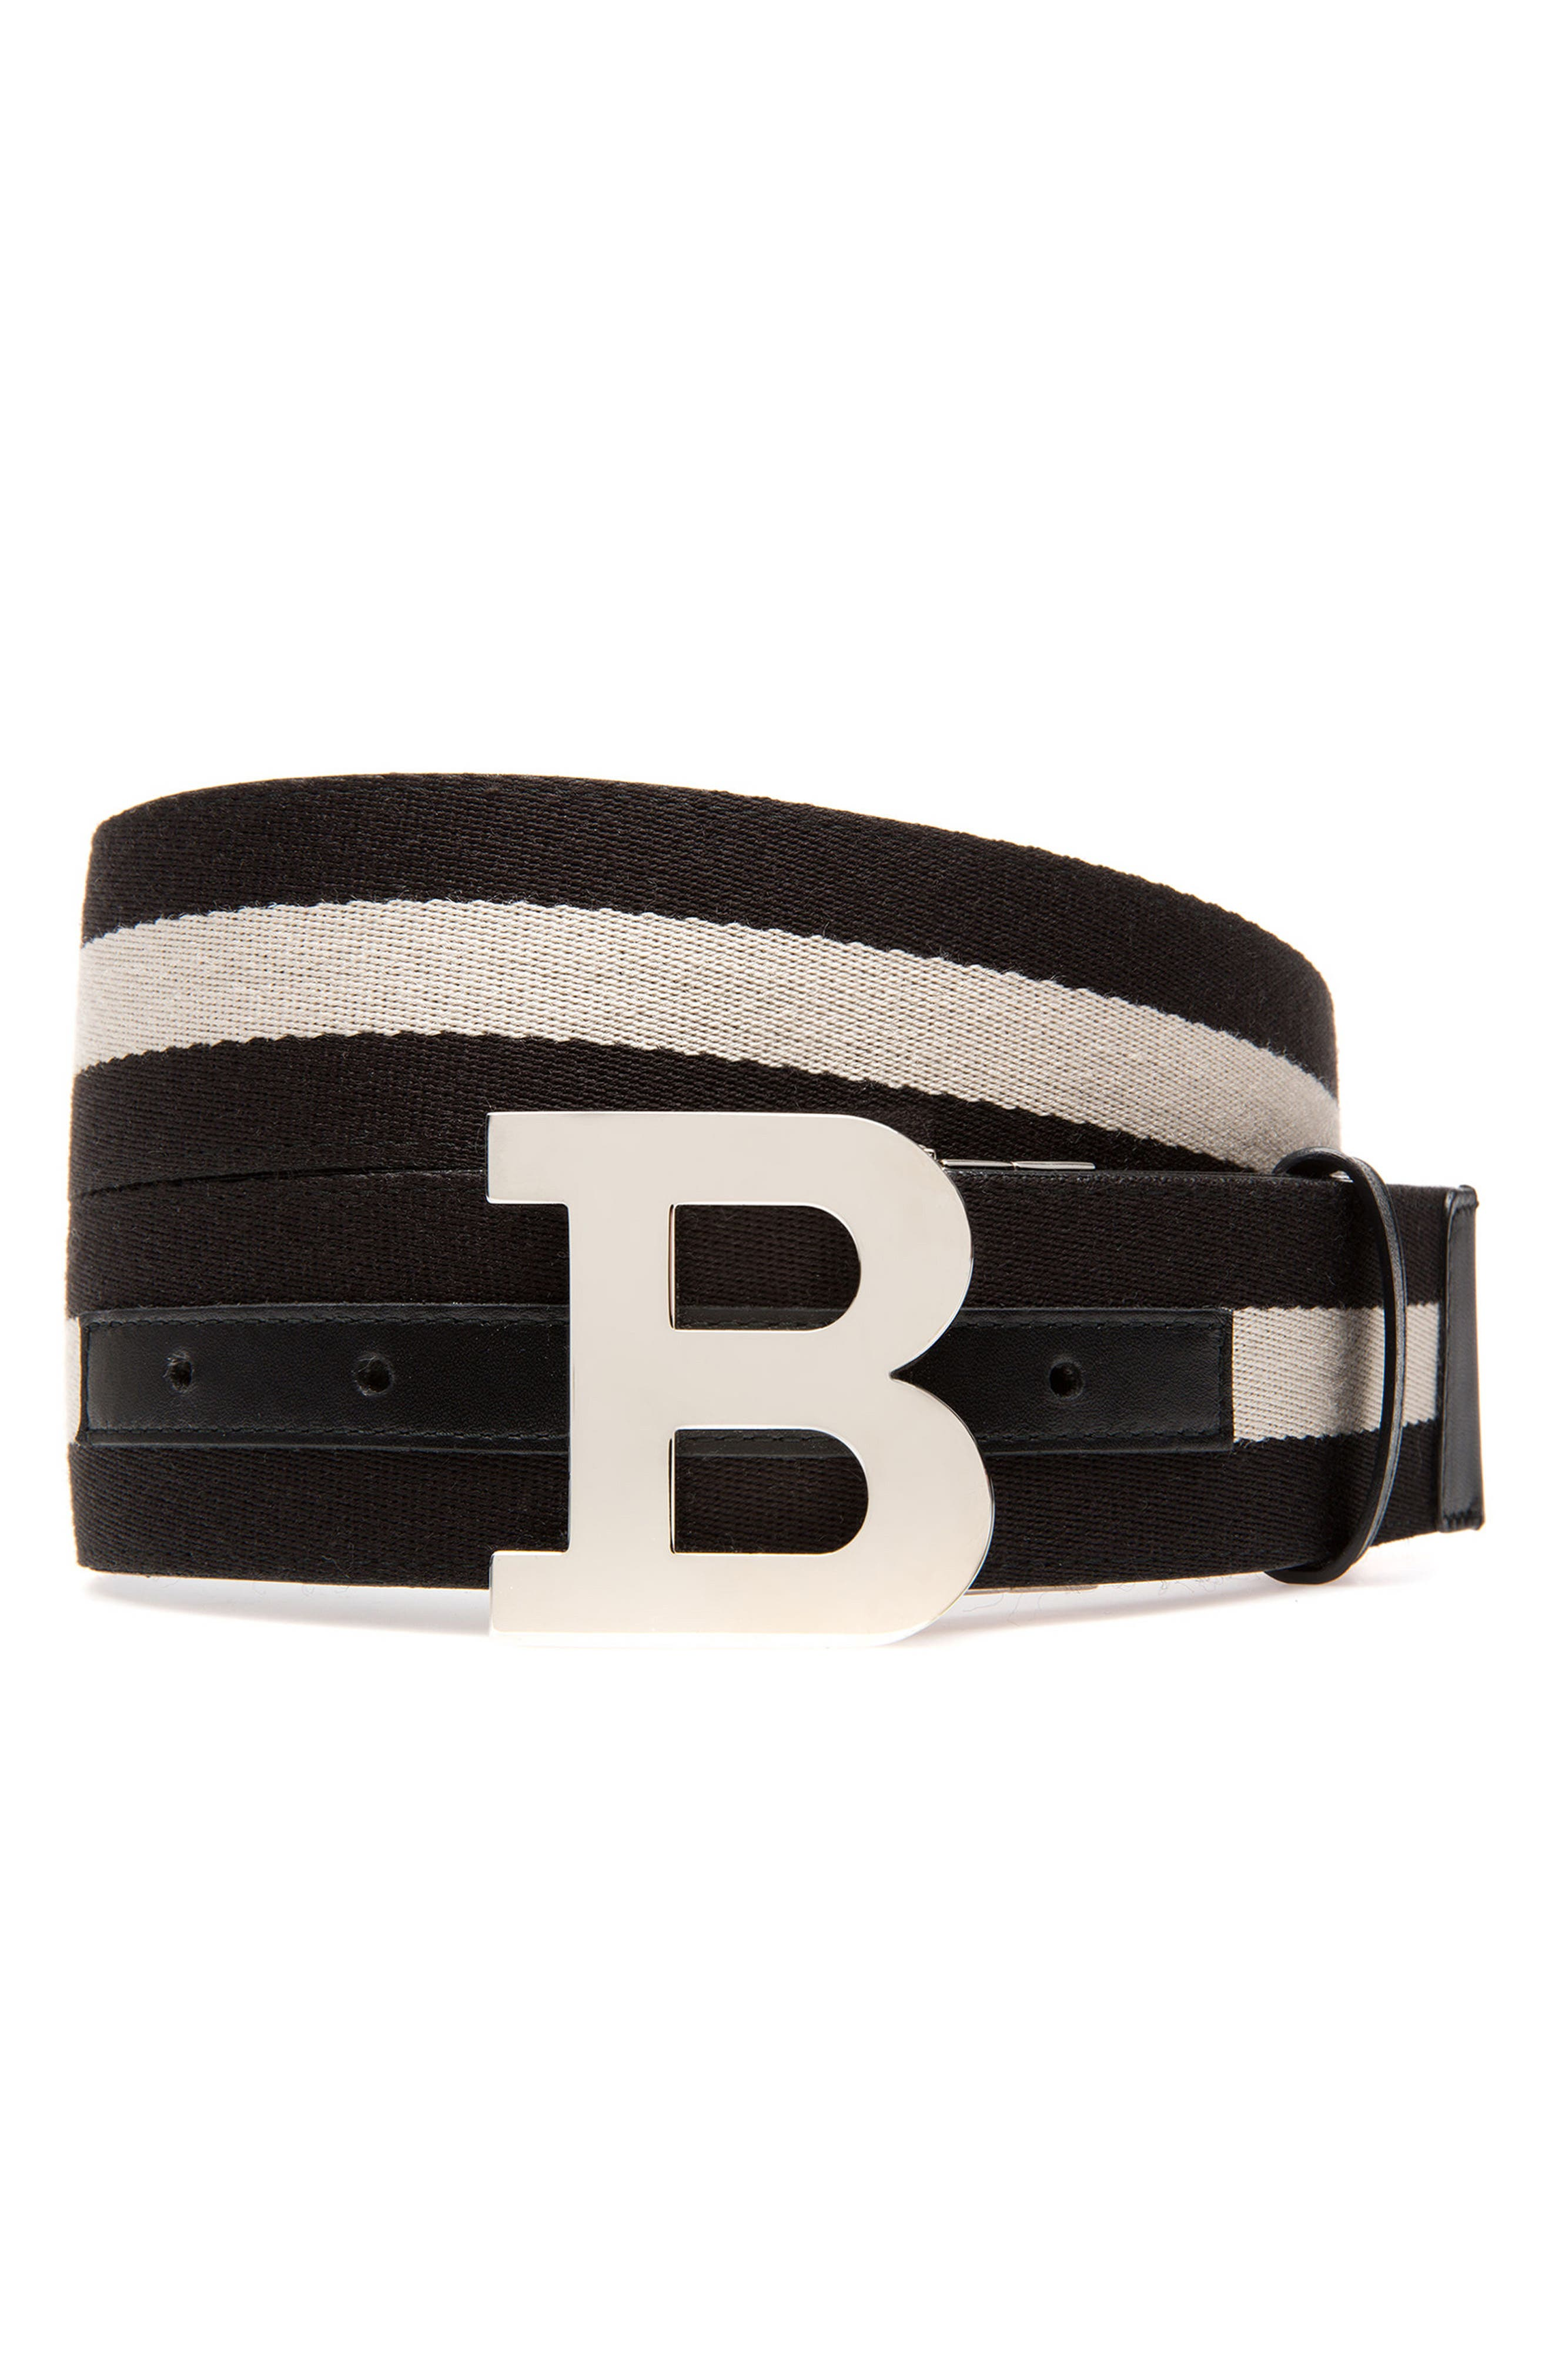 B-Buckle Reversible Webbed Belt,                         Main,                         color, Black/ Bone